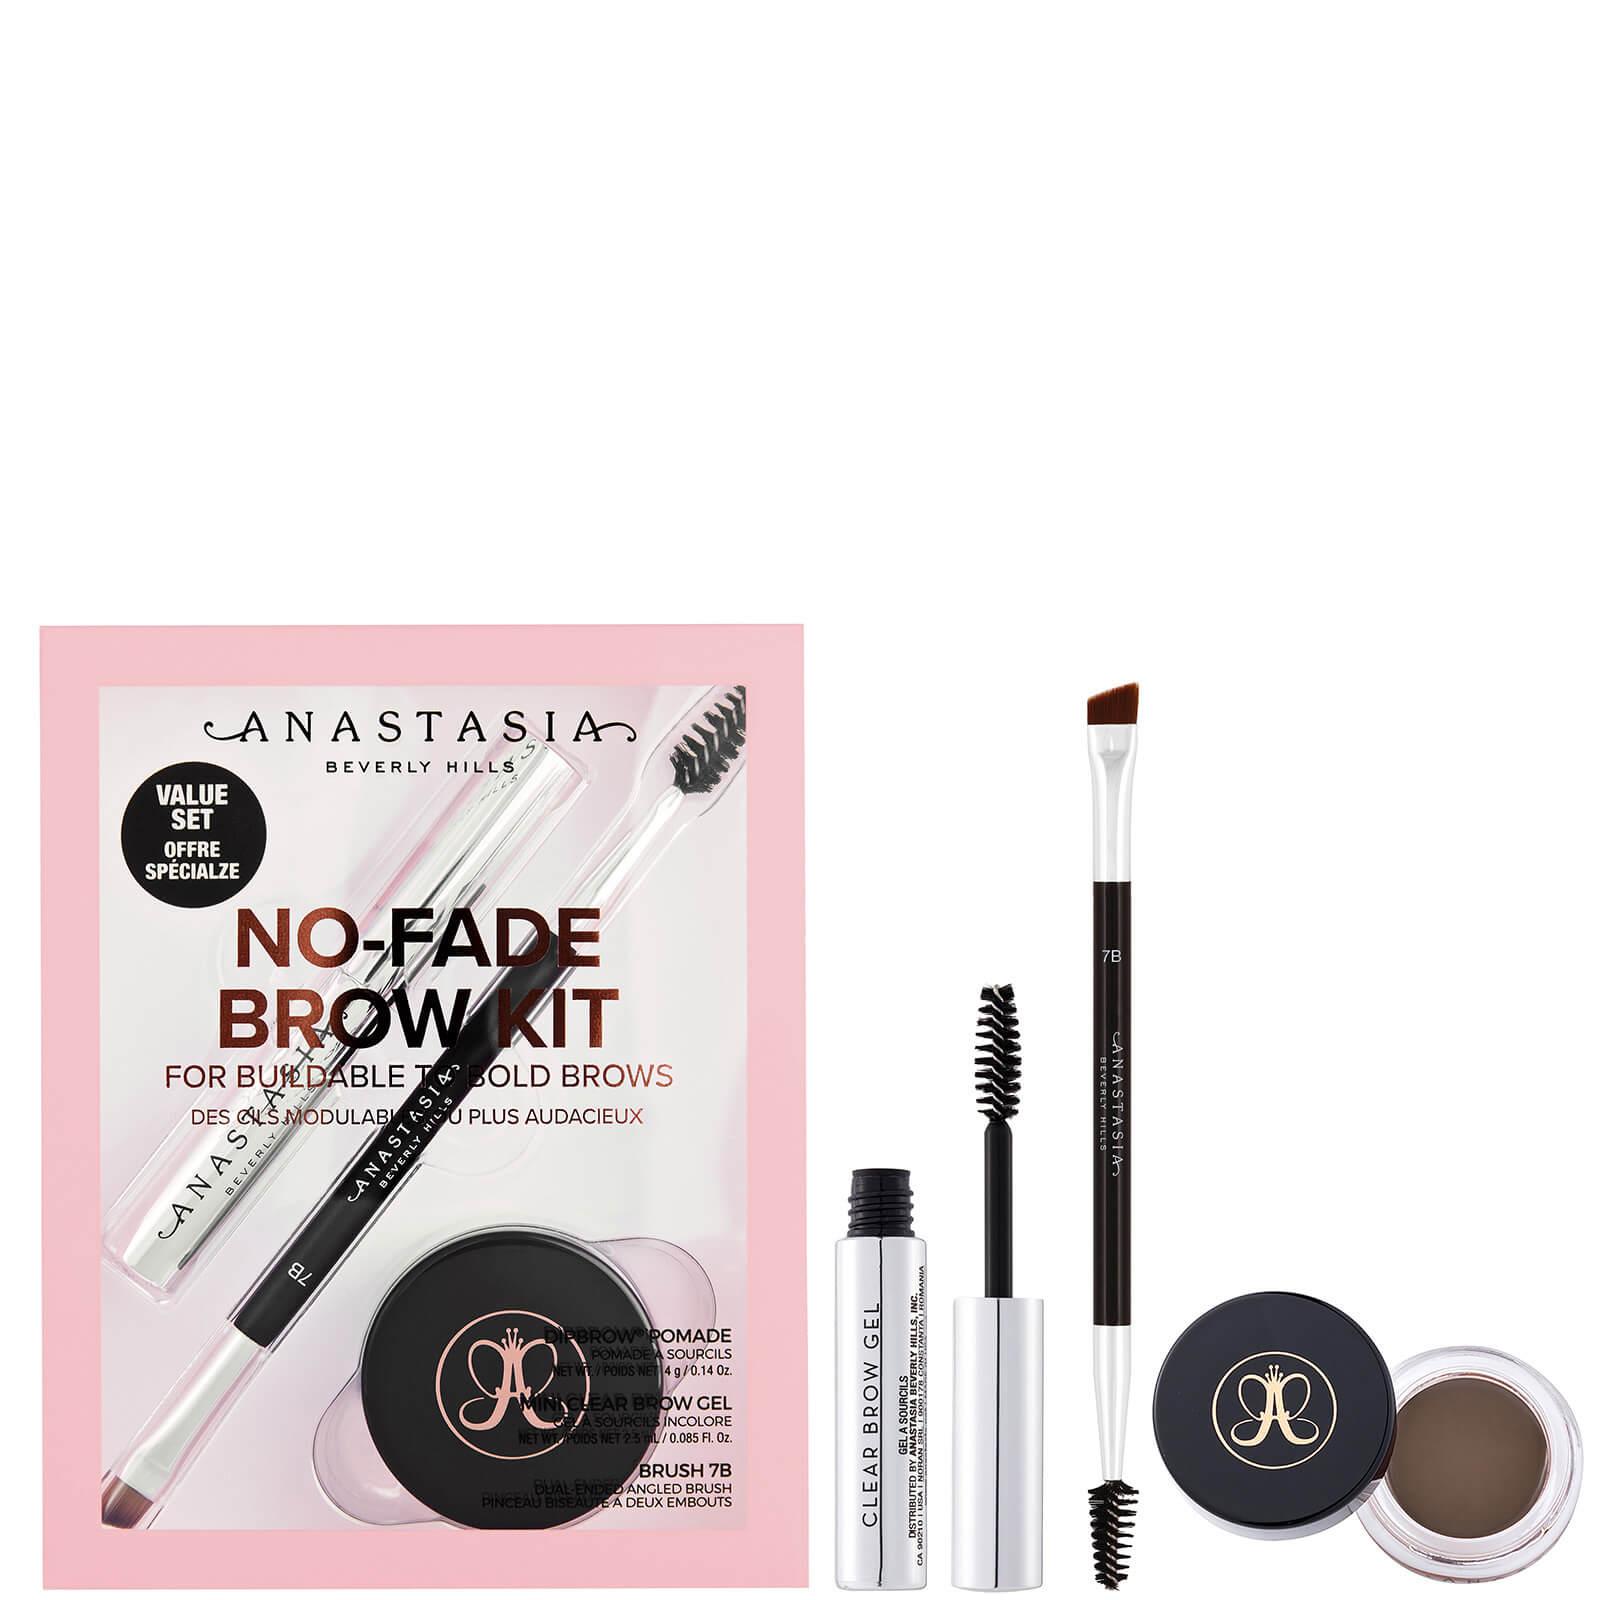 Anastasia Beverly Hills No-Fade Brow Kit 9.5g (Various Shades) - Medium Brown